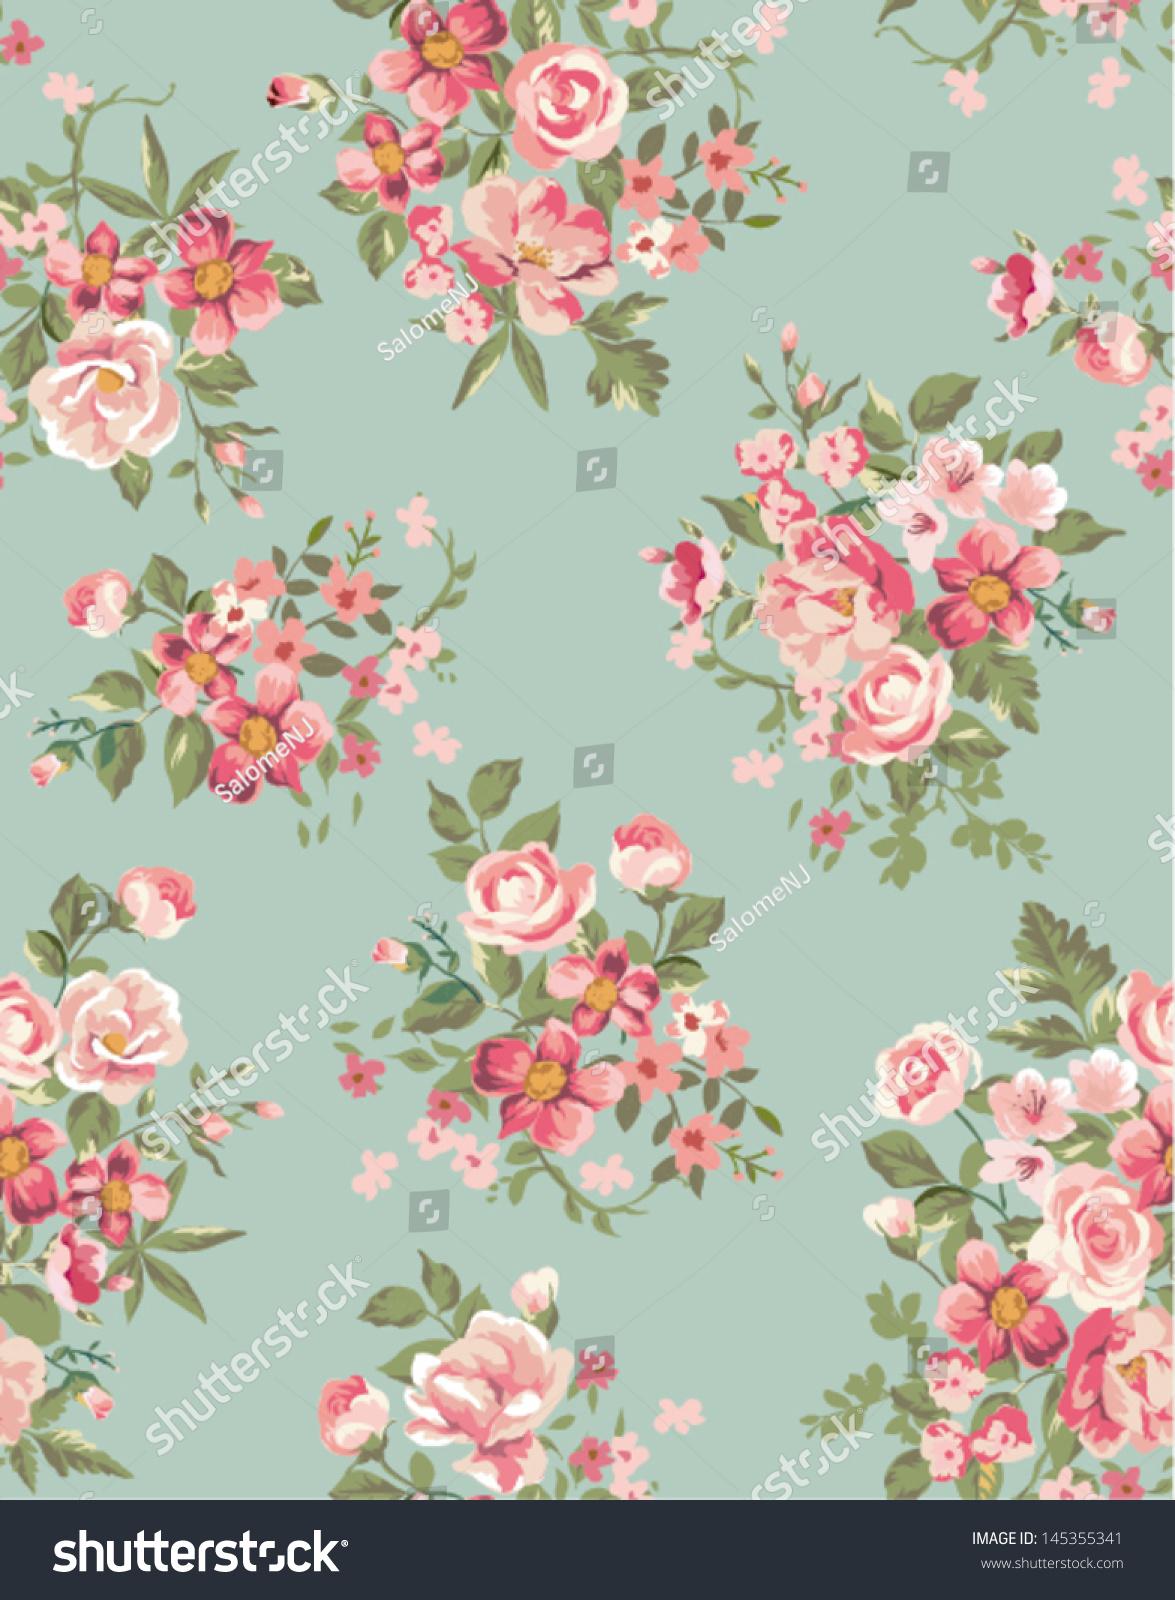 Vintage Floral Flower Seamless Pattern Background Stock Vector